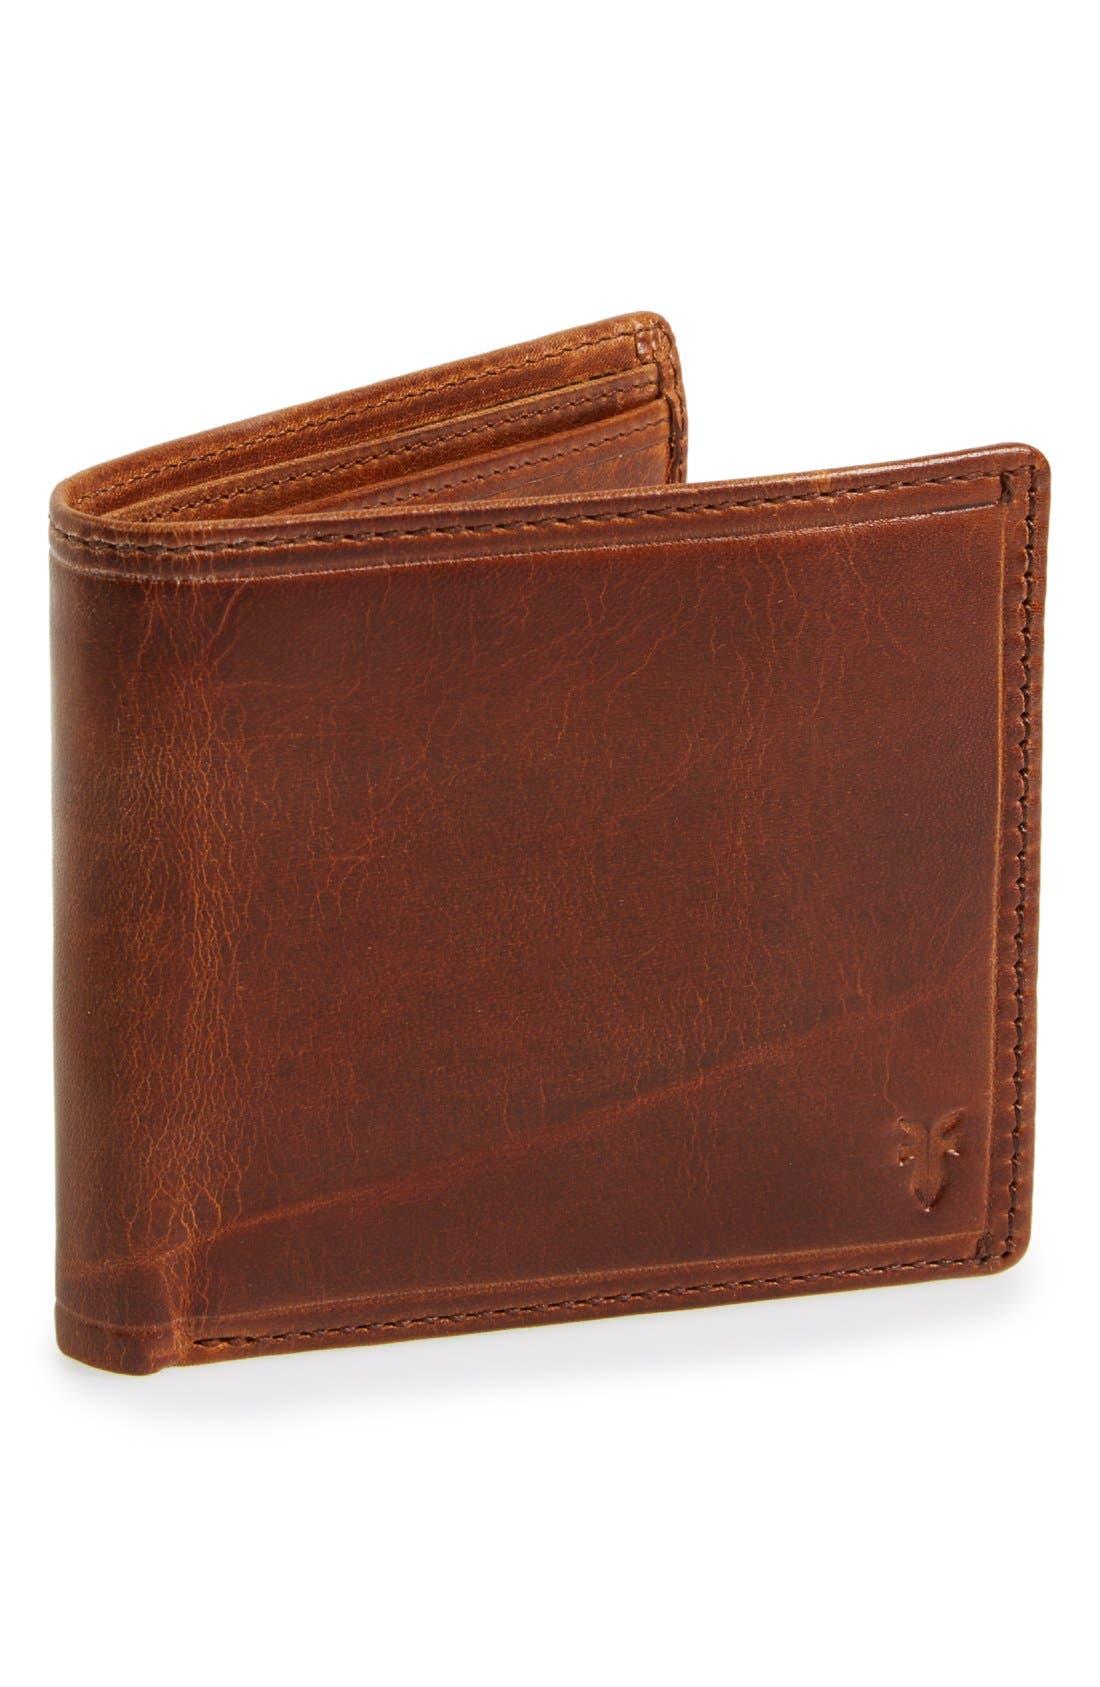 'Logan' Leather Billfold Wallet,                         Main,                         color, COGNAC